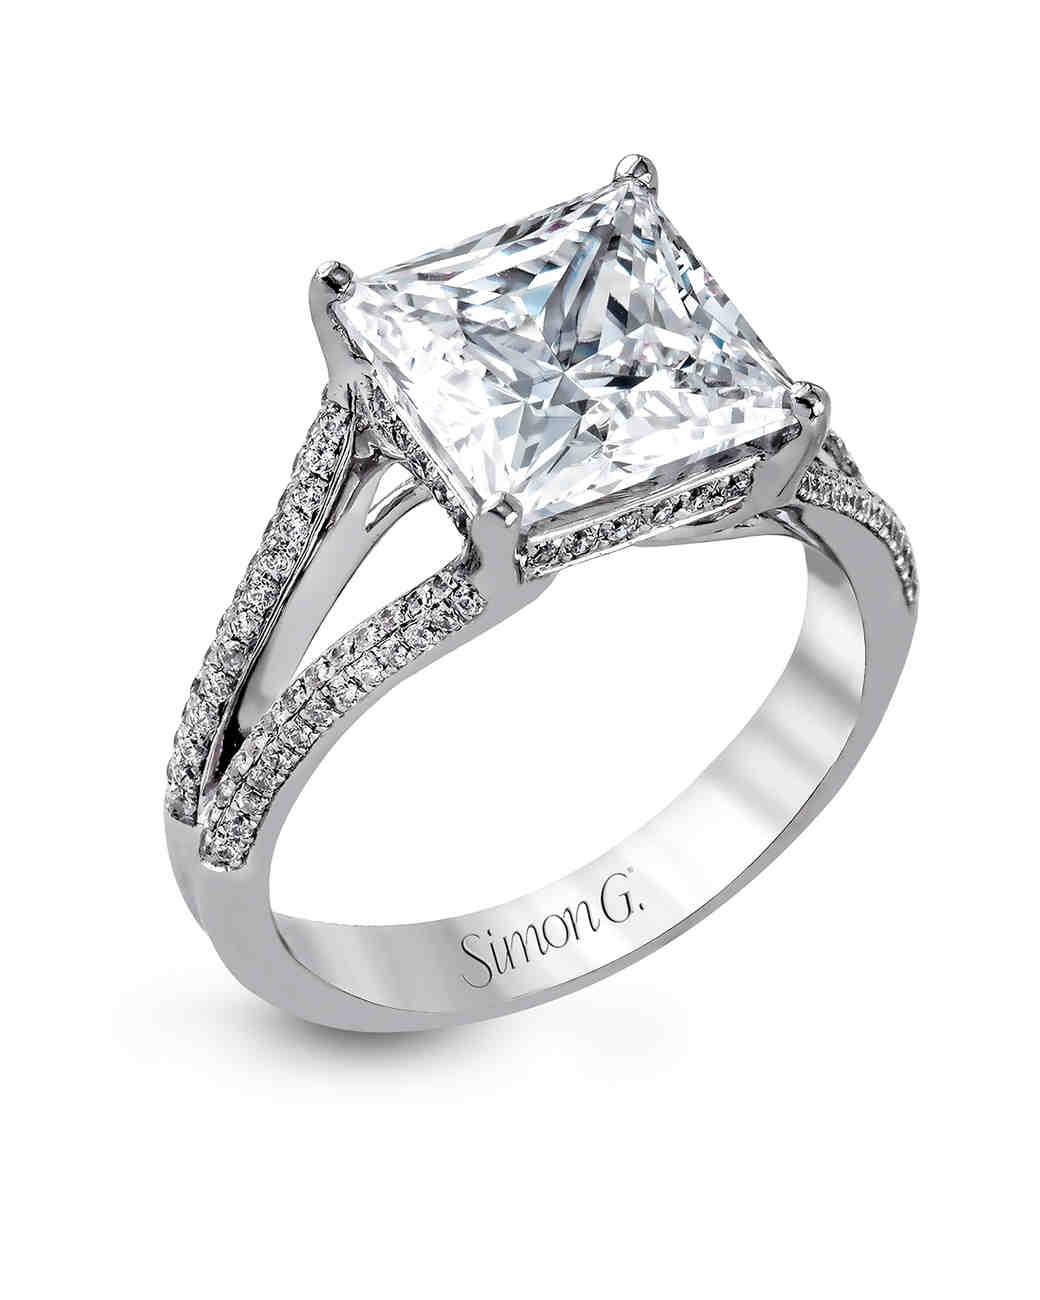 Simon G. Princess-Cut Engagement Ring